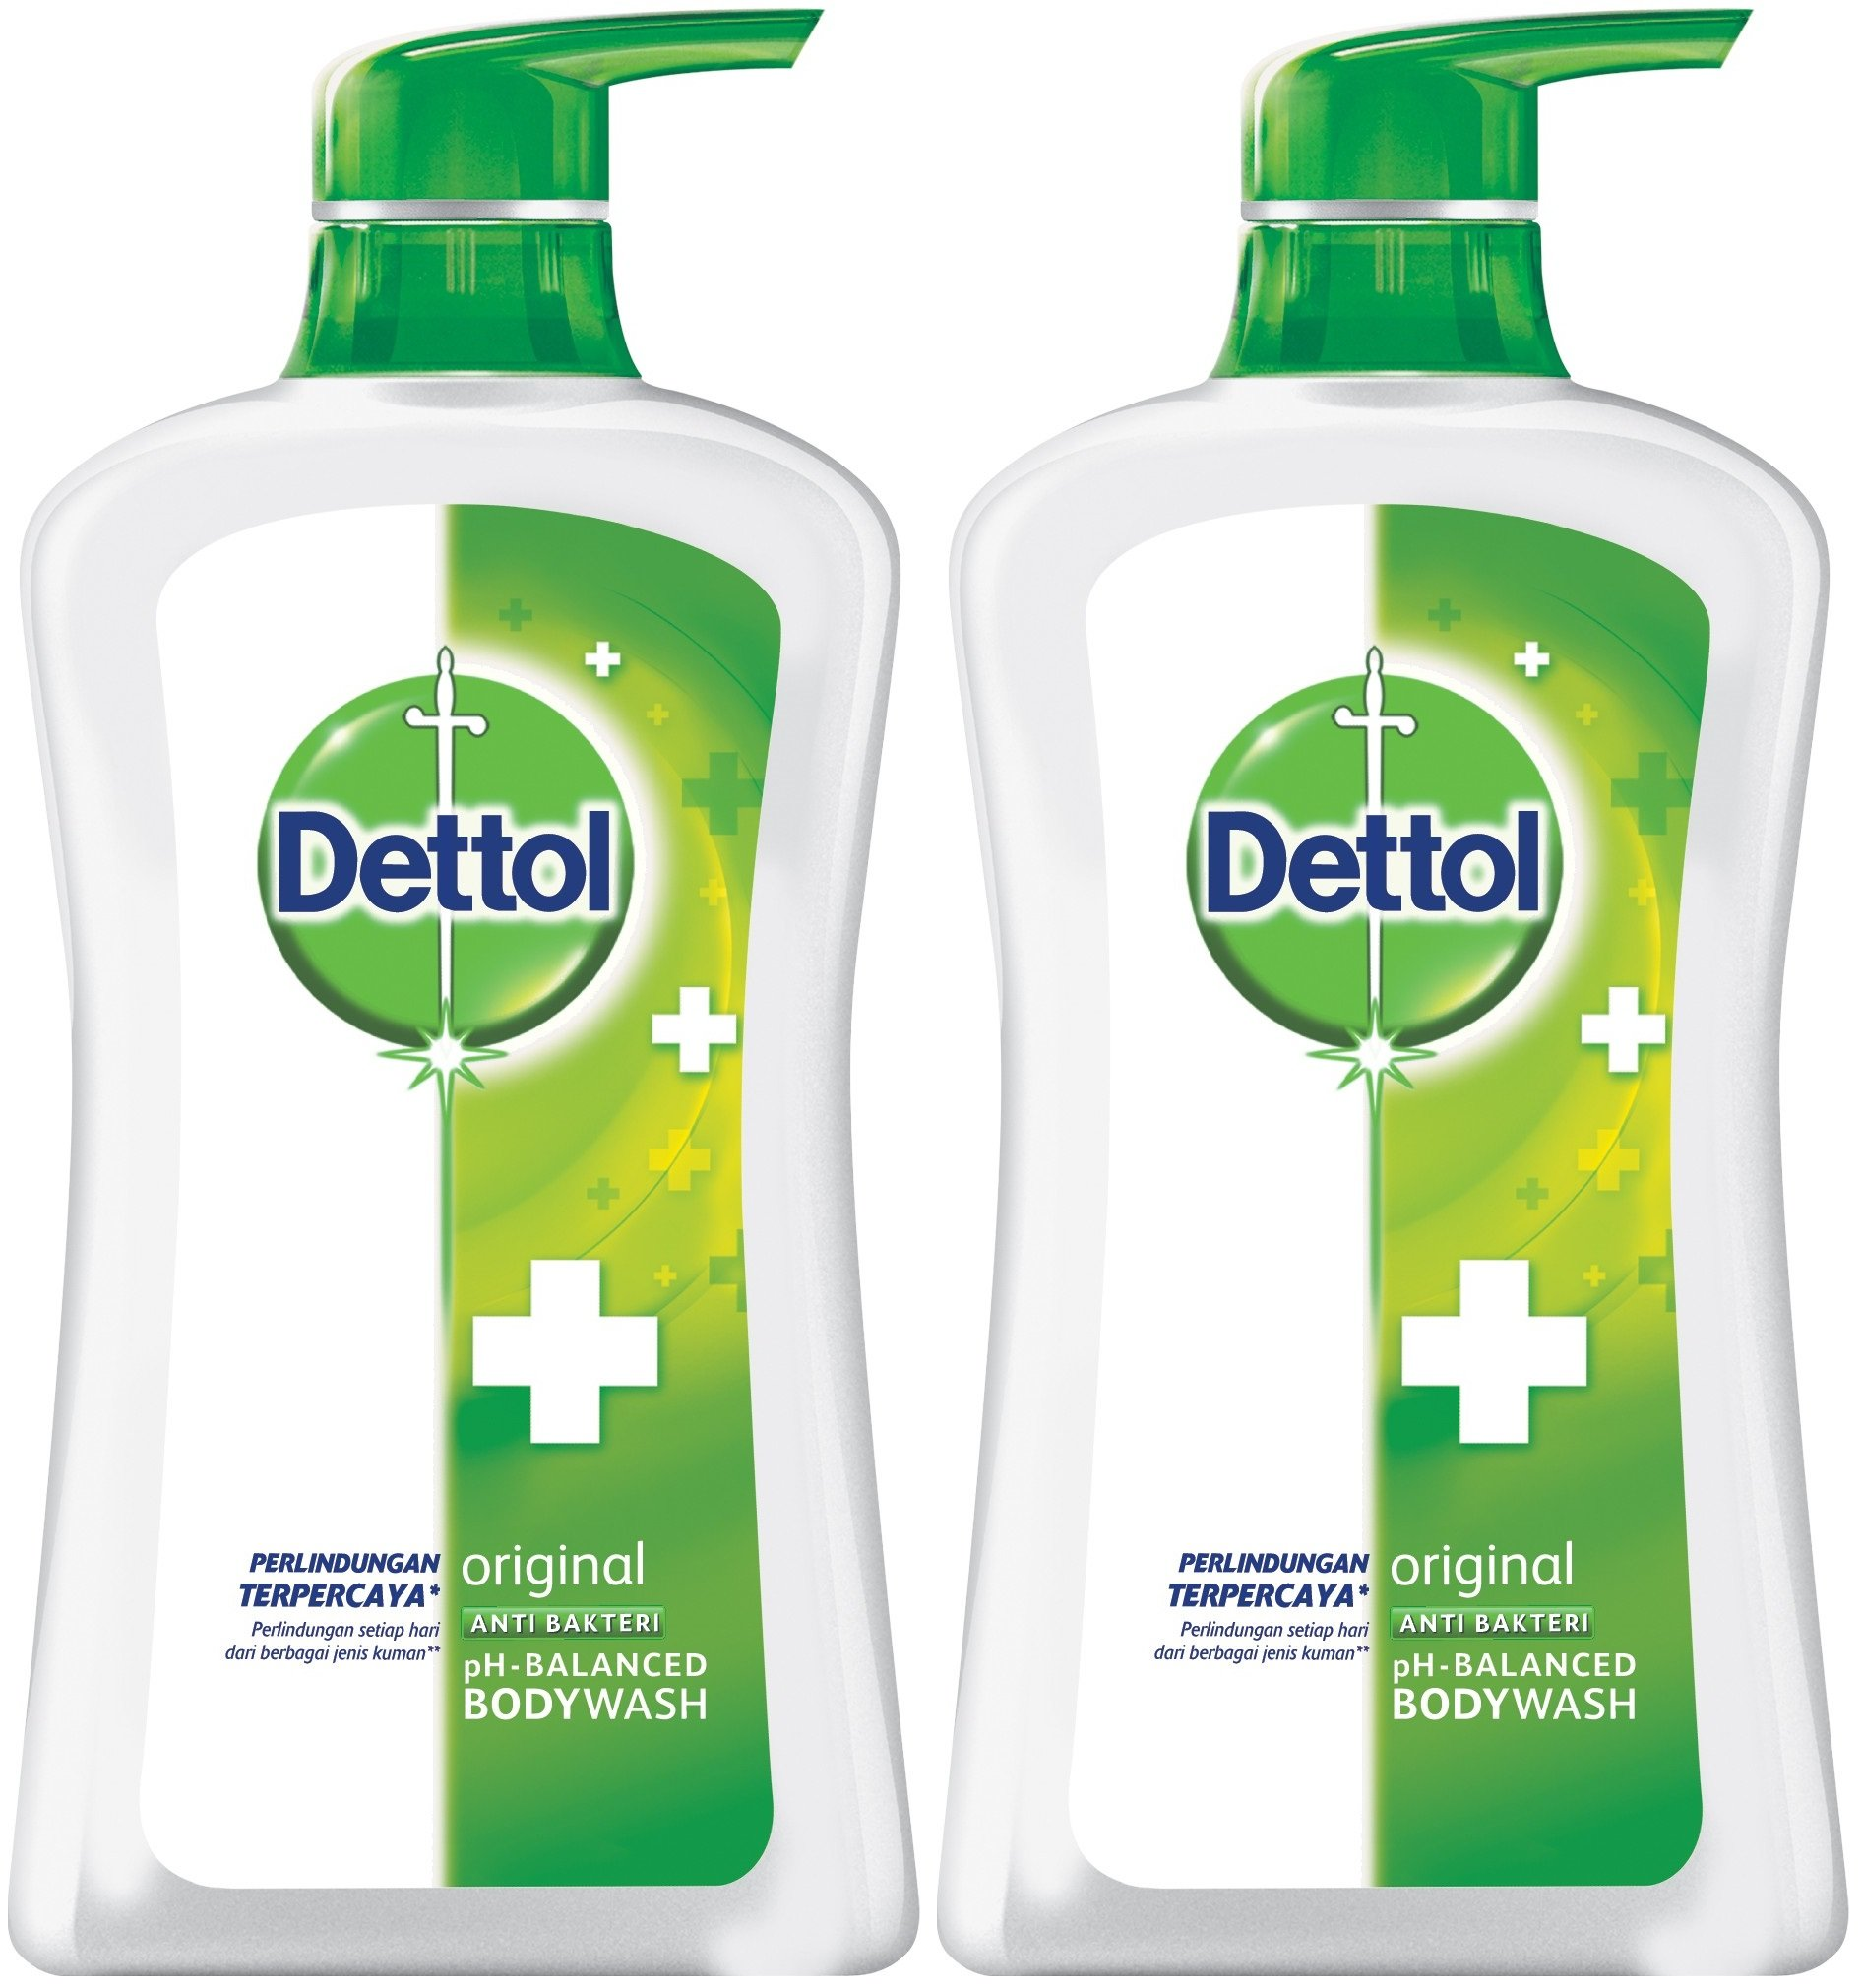 Dettol Topical Antiseptic Liquid 2535 Floz750ml Hand Sanitizer Original 50 Ml 4 Pcs Anti Bacterial Ph Balanced Body Wash 211 Oz 625